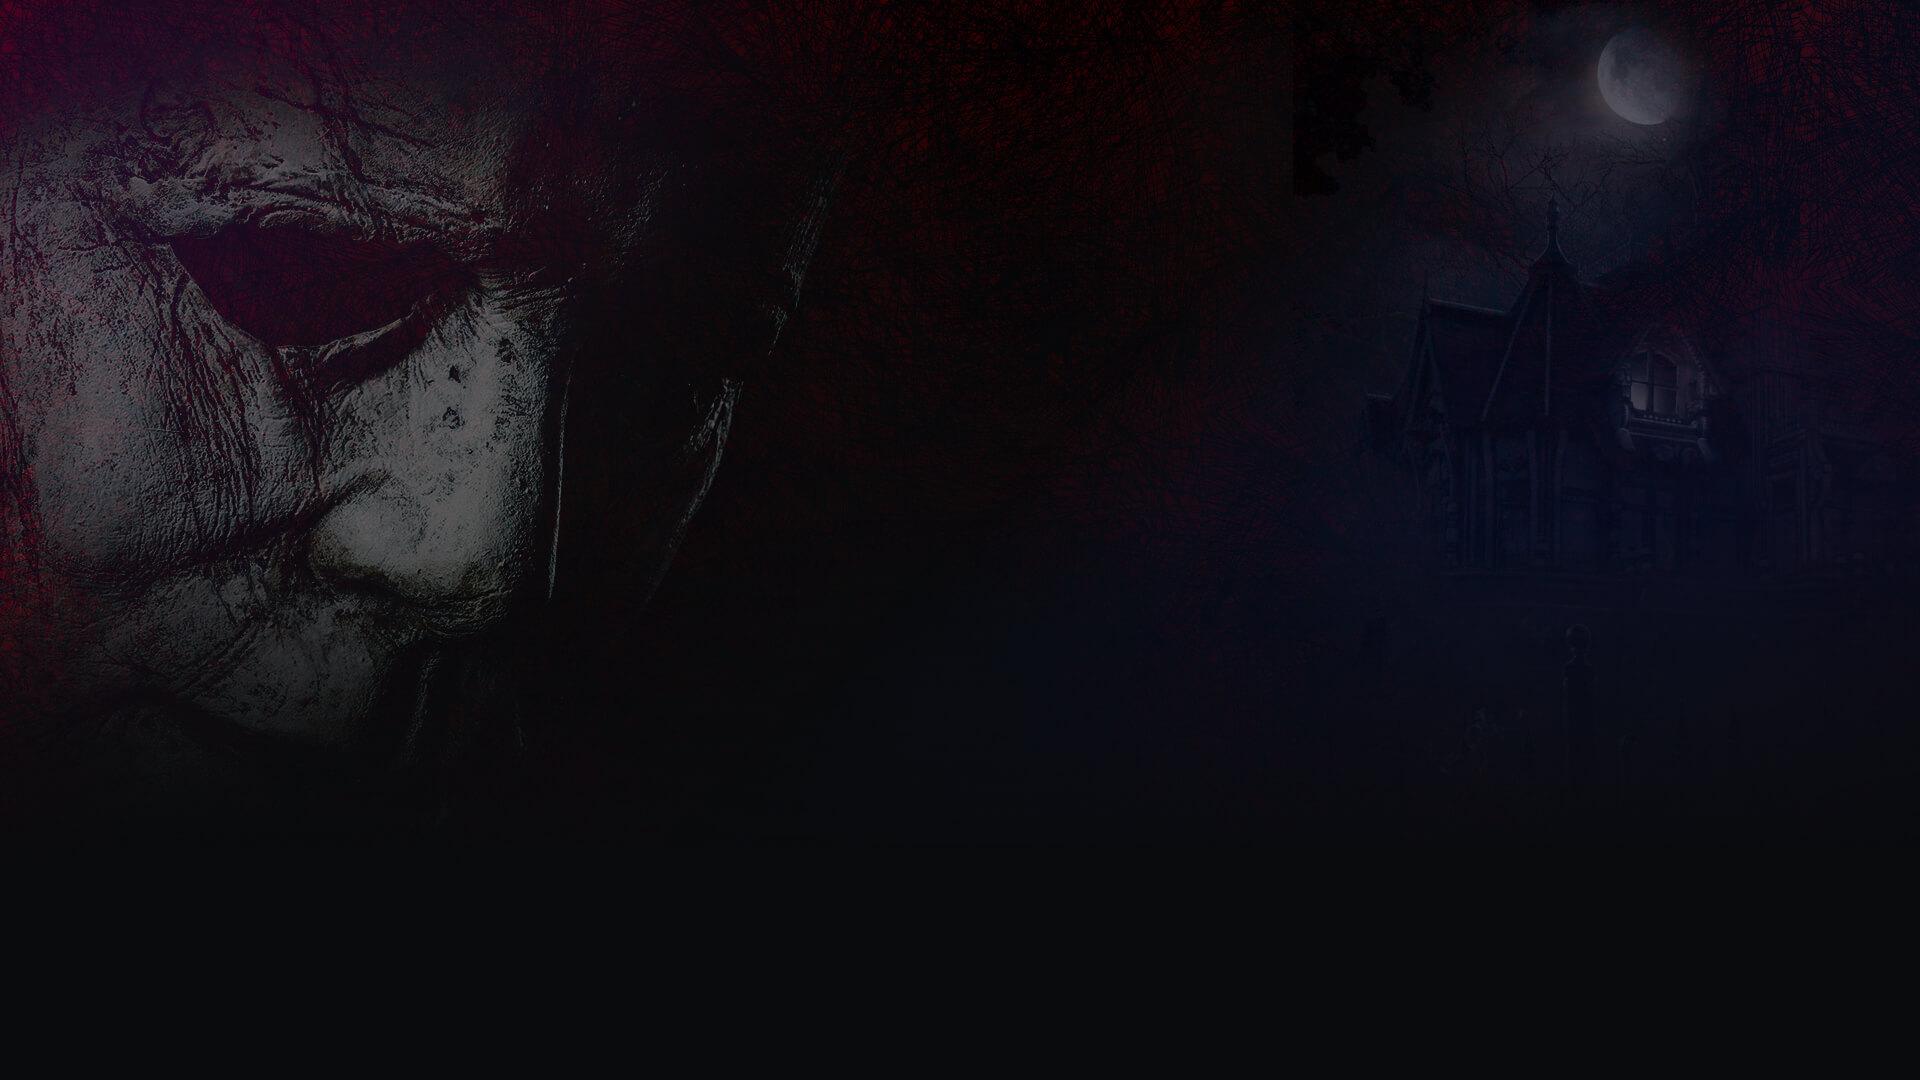 Image thématique du film Halloween